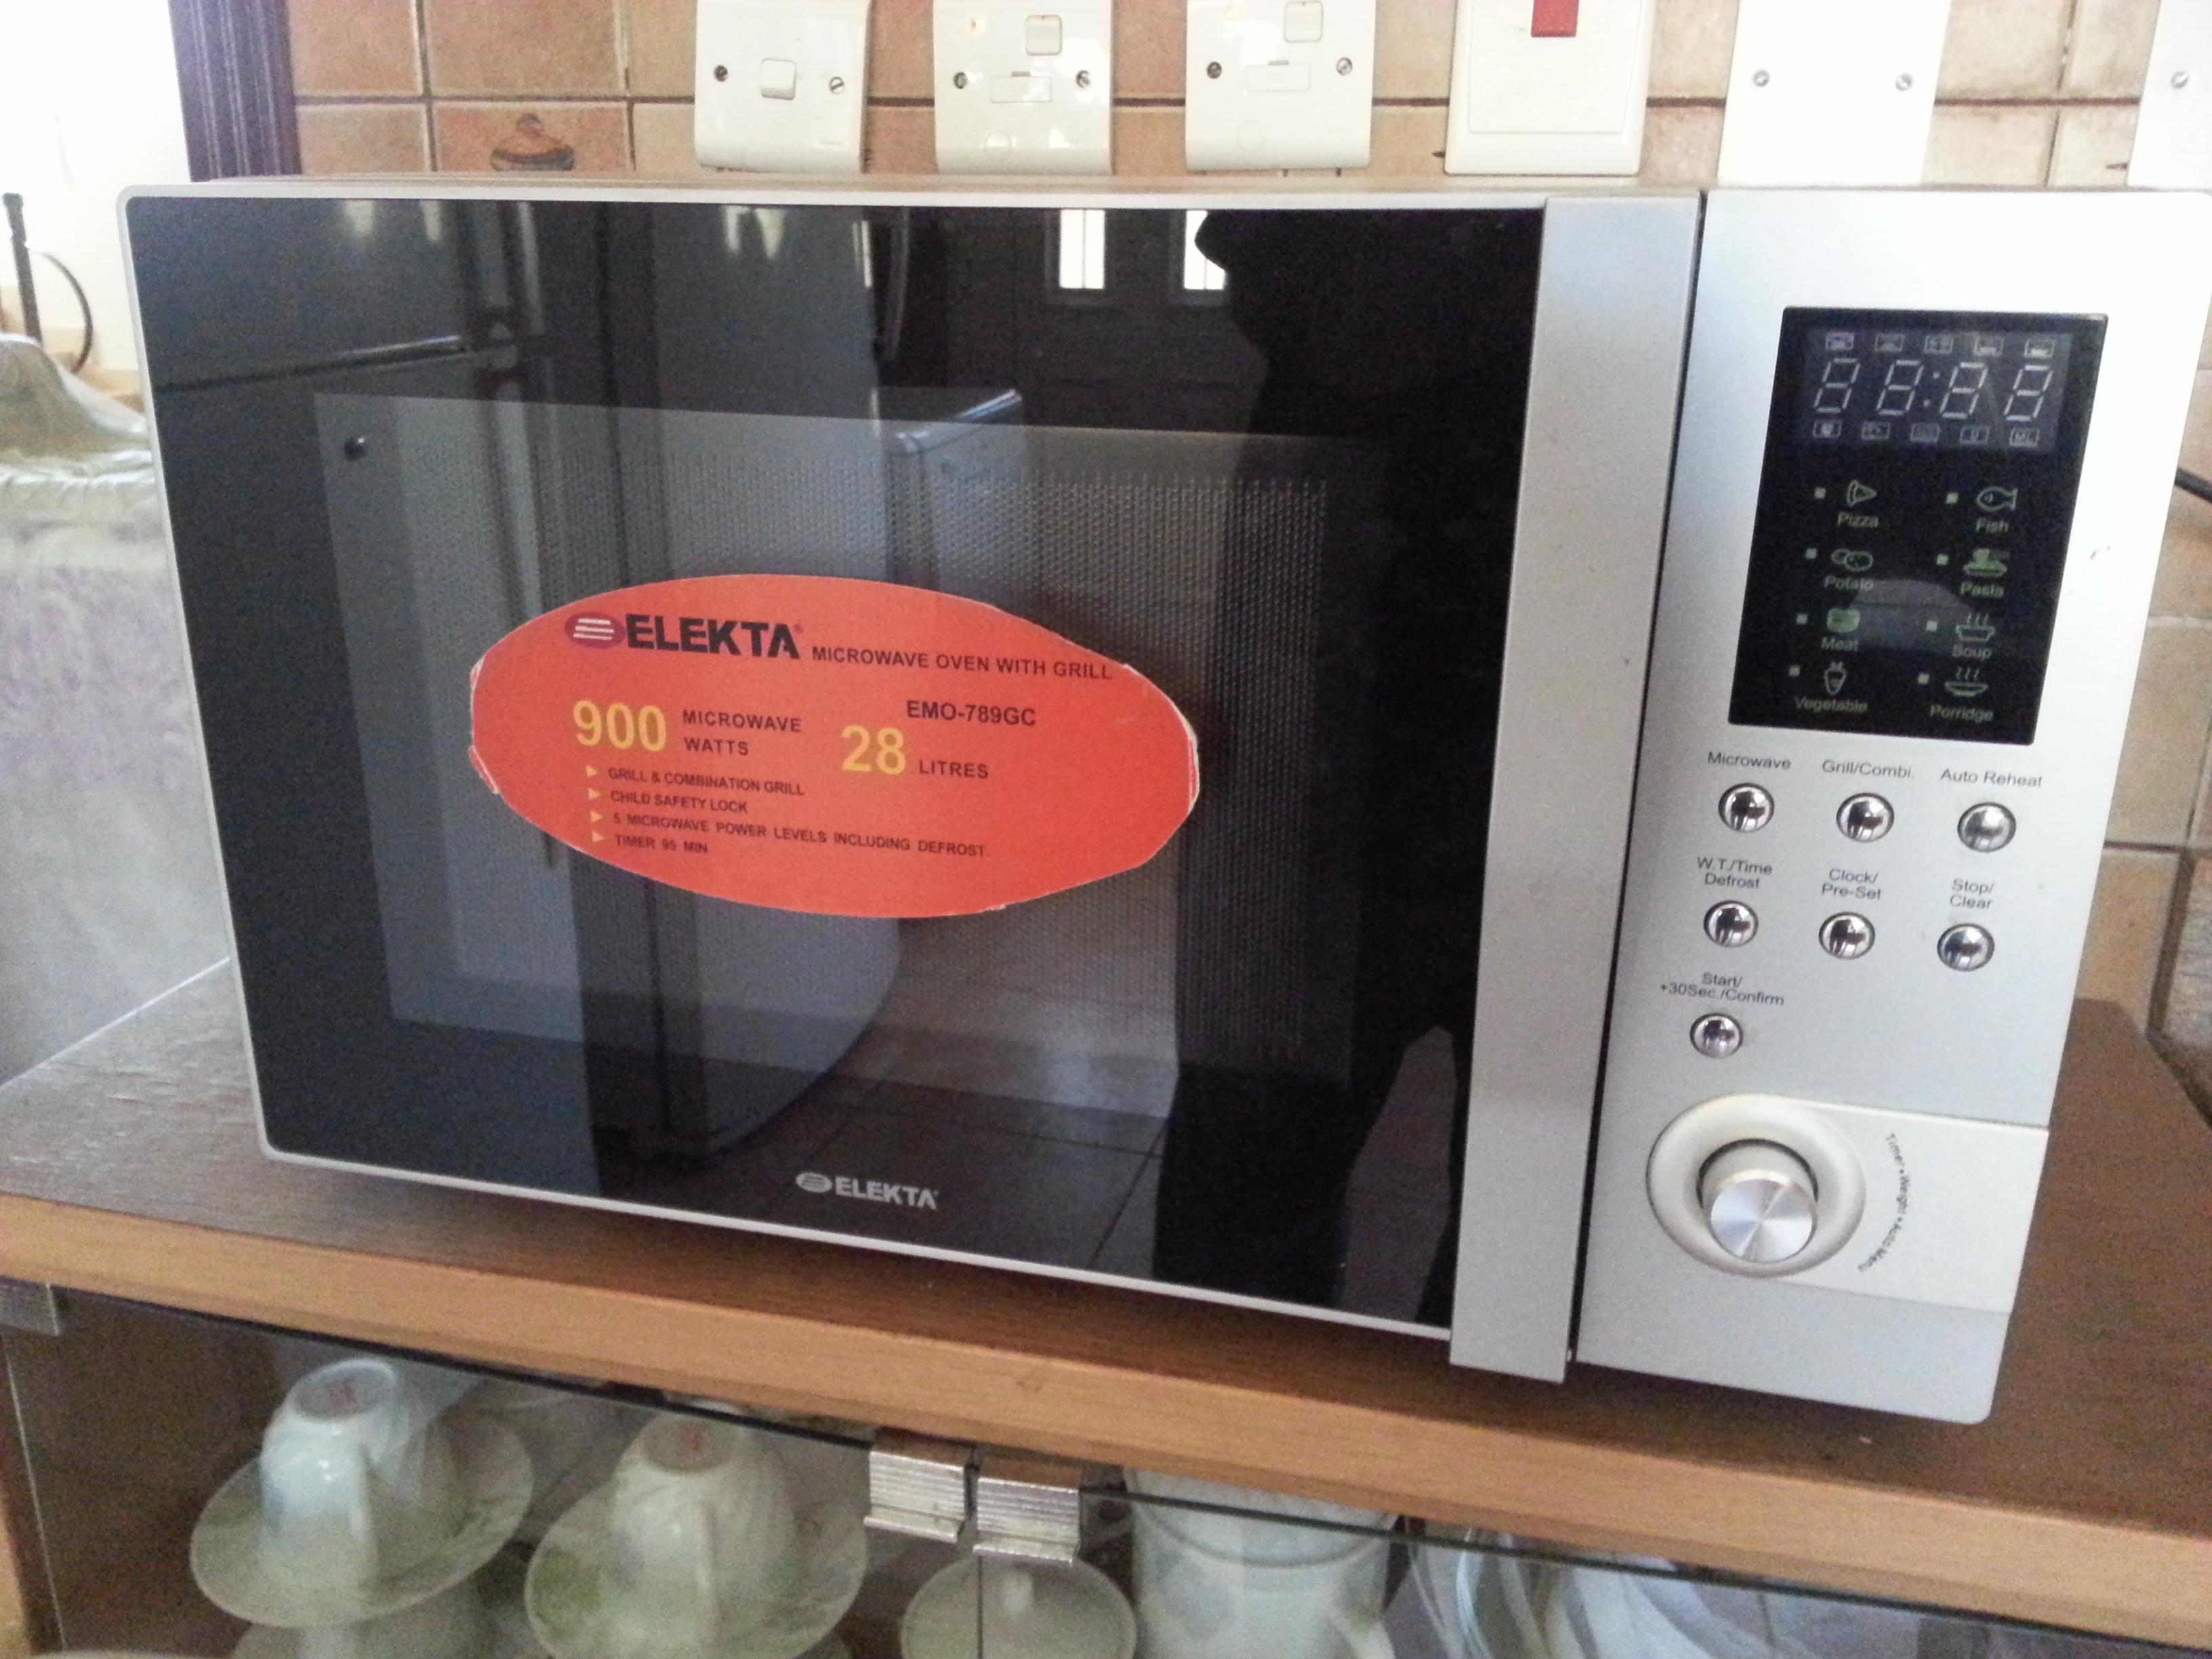 title; title; title; title. Information. One elakta microwave oven.